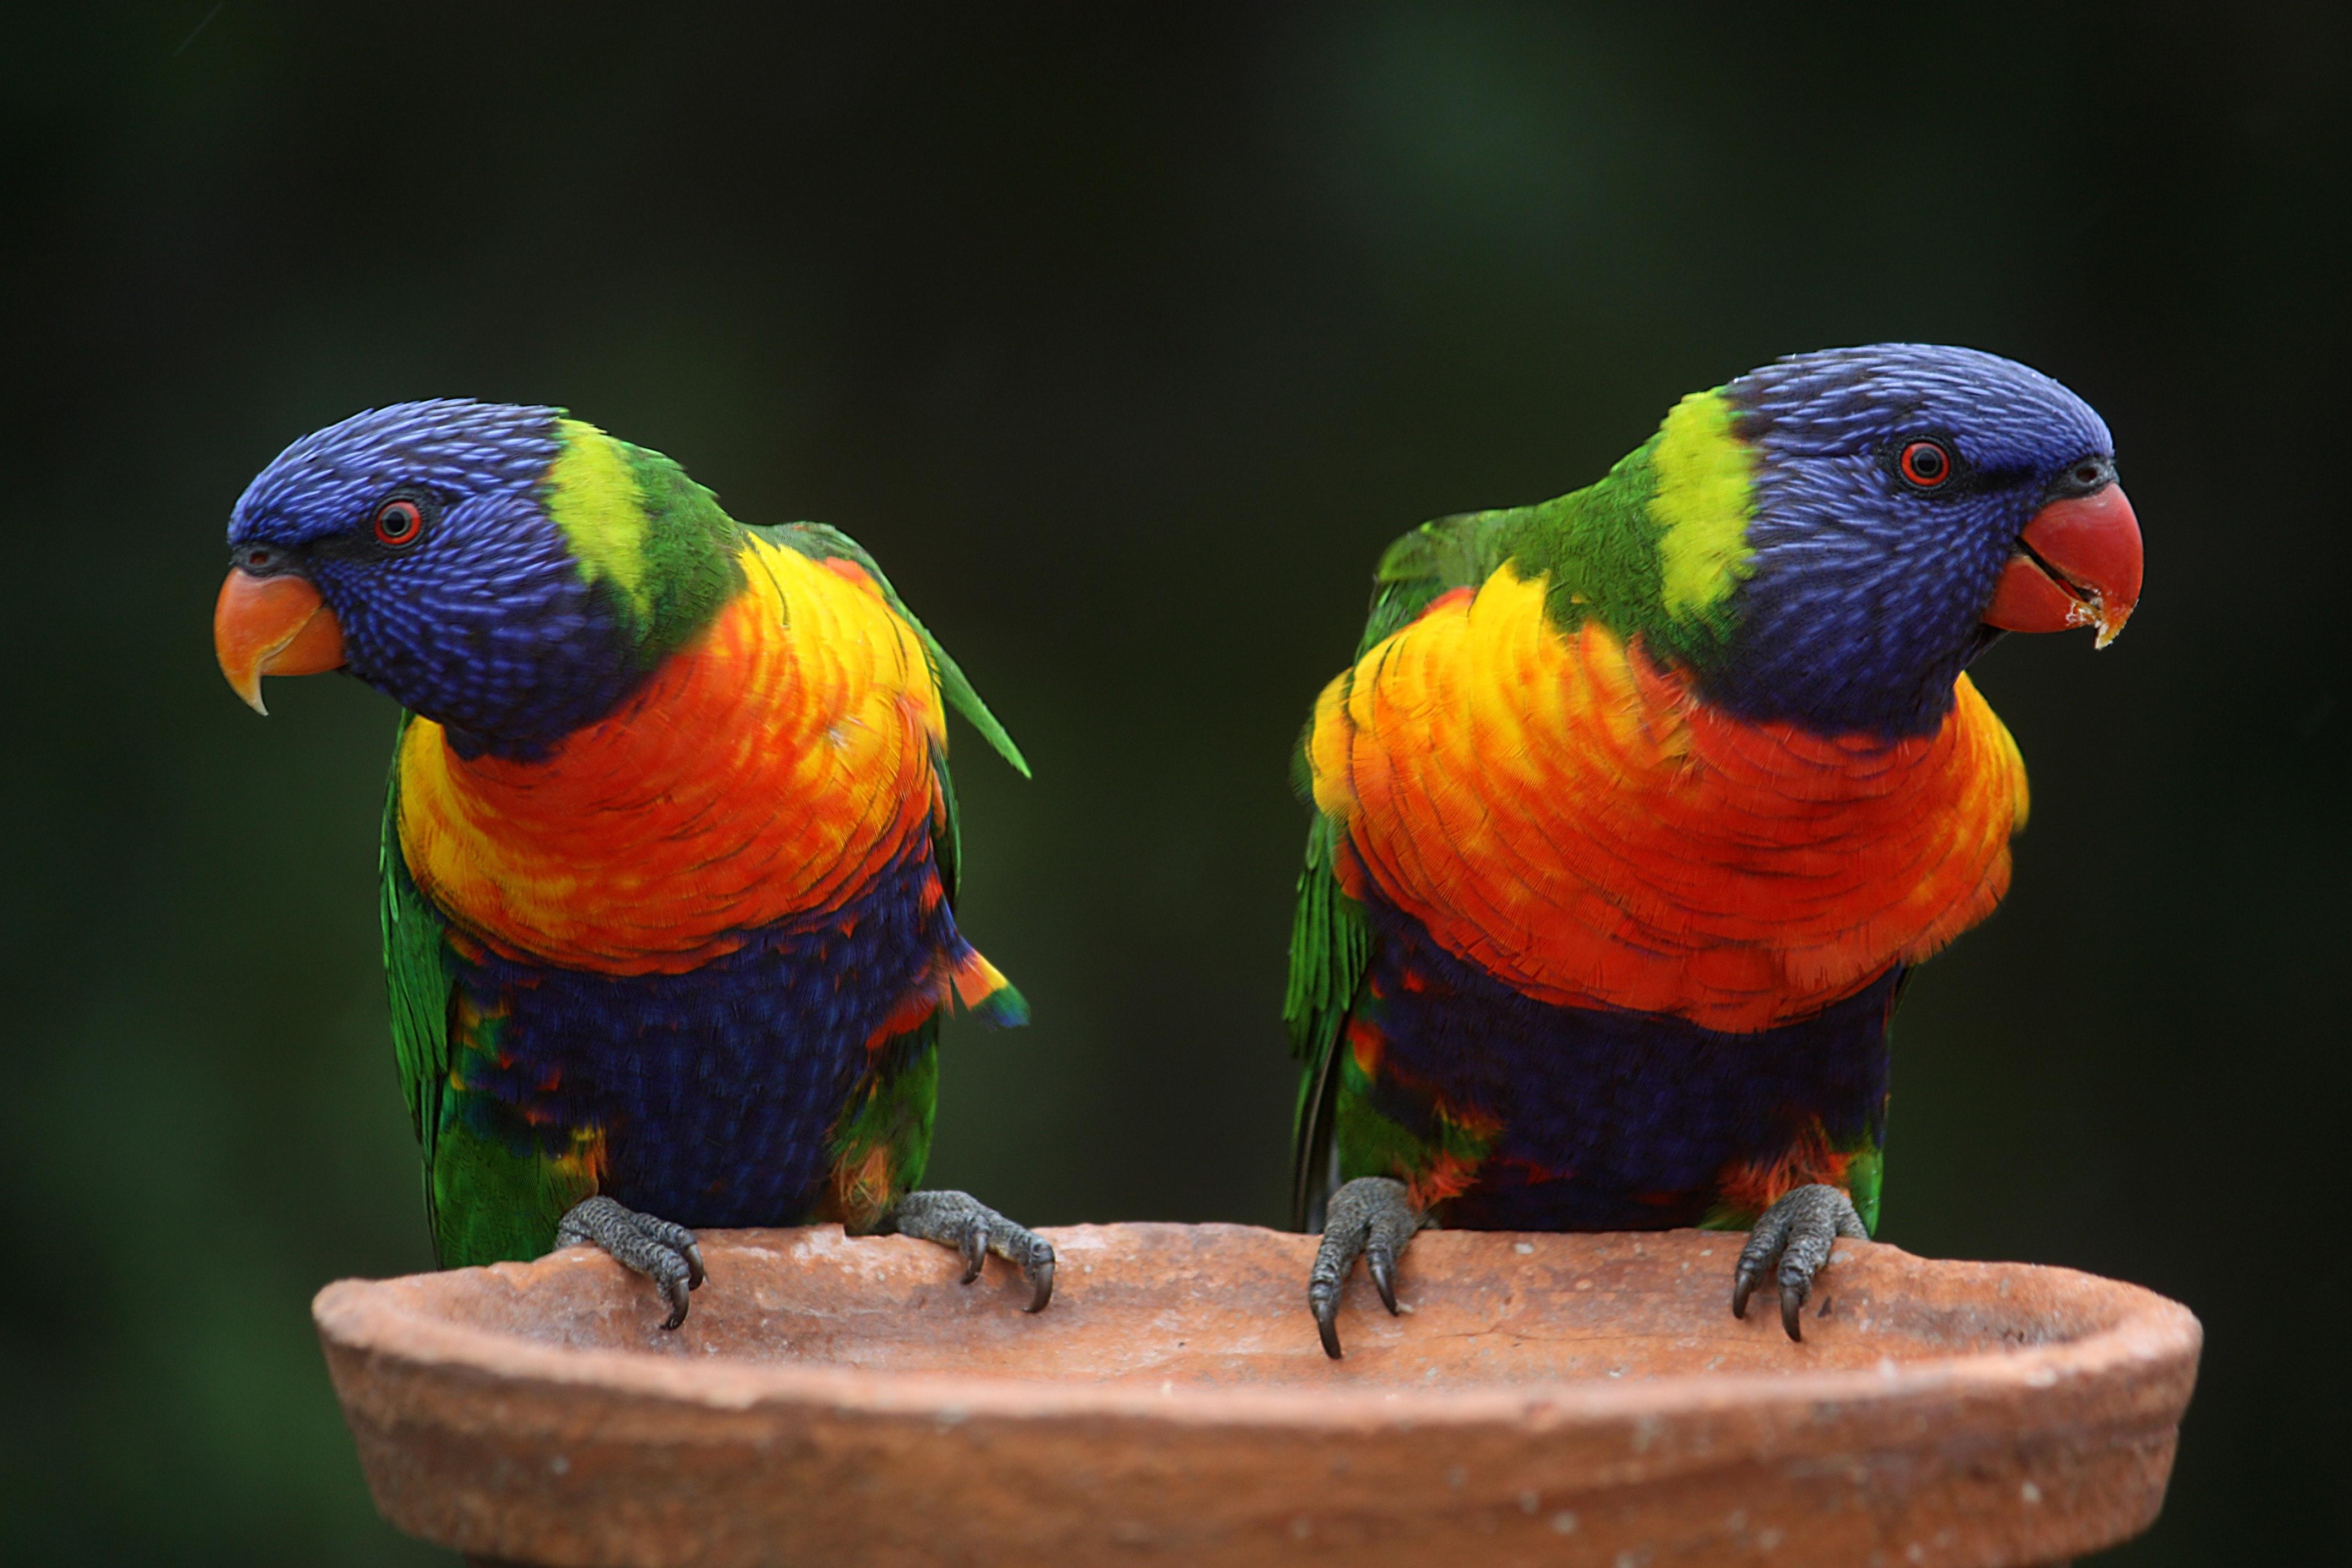 Blue Geeen and Orange Parrot, Animals, Beautiful, Bird, Birds, HQ Photo